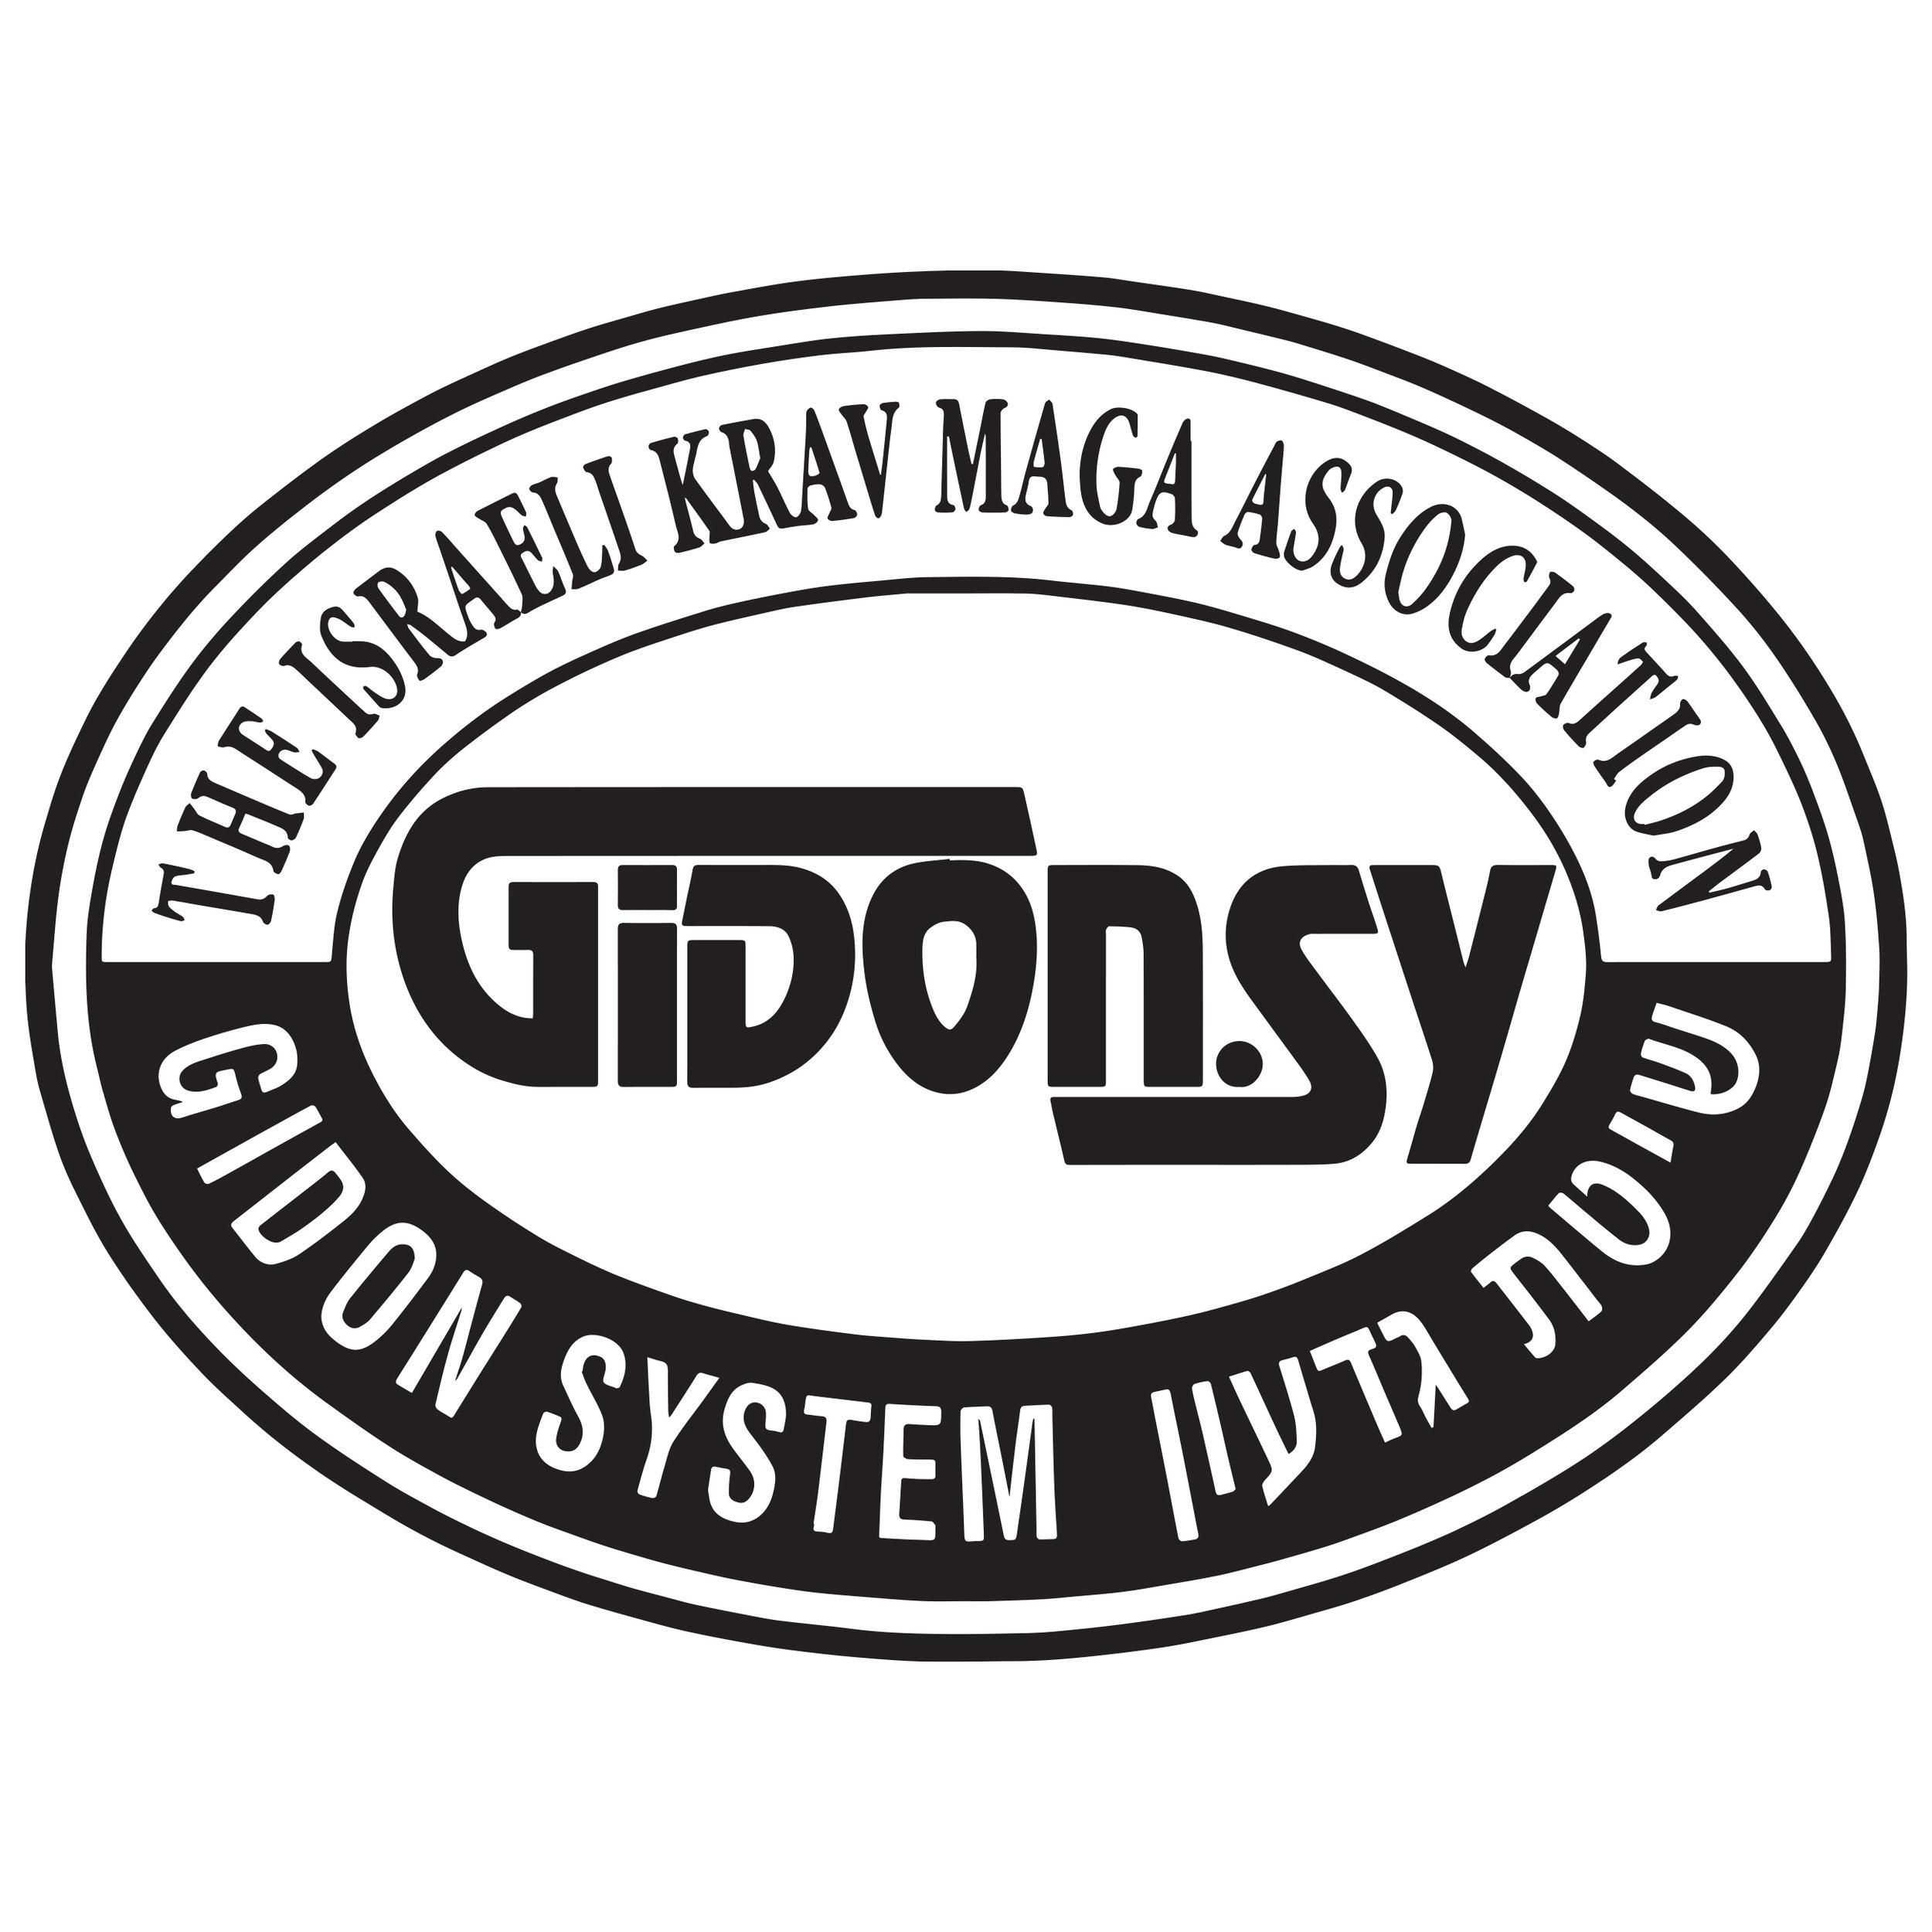 GIDON SYSTEM LOGO